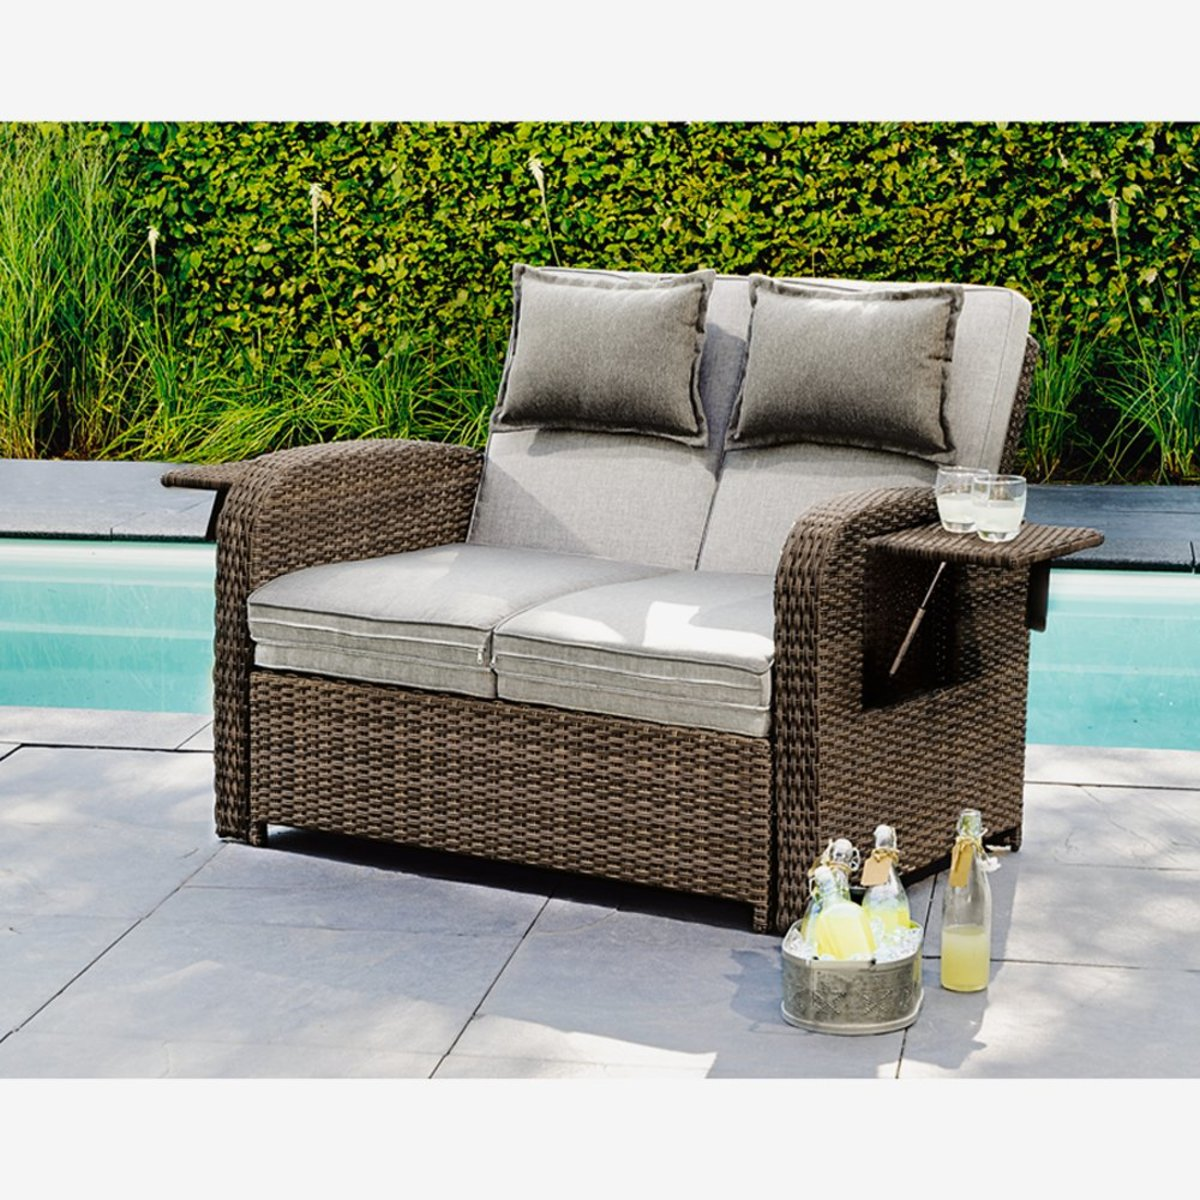 "Bild 2 von Multifunktions-Sofa ""Trinidad"" 117 x 90 x 90 cm"